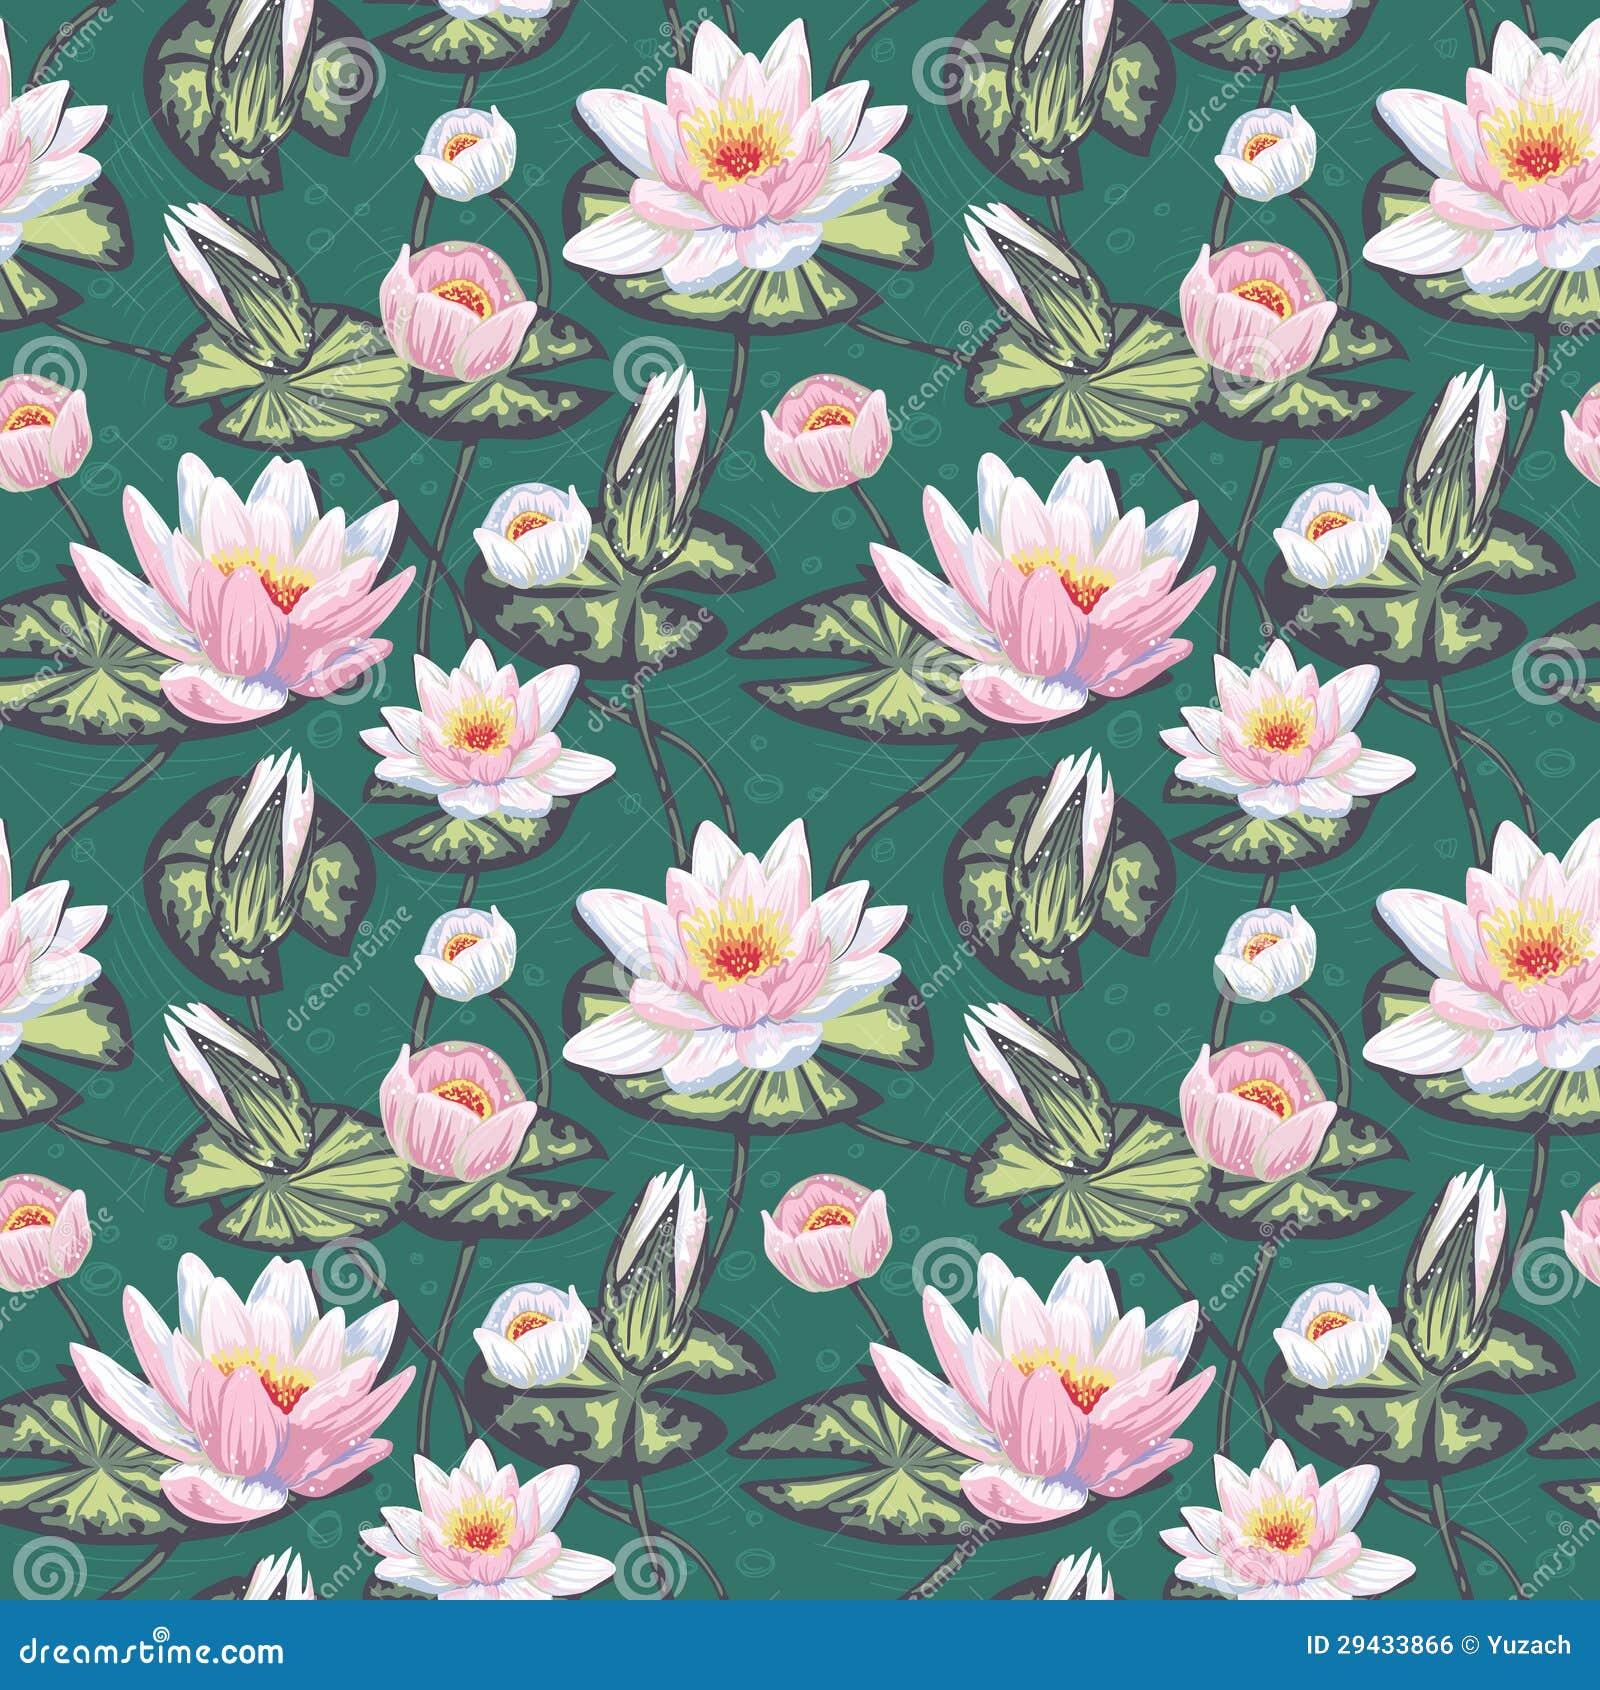 Retro Floral Wallpaper Vintage Patterns